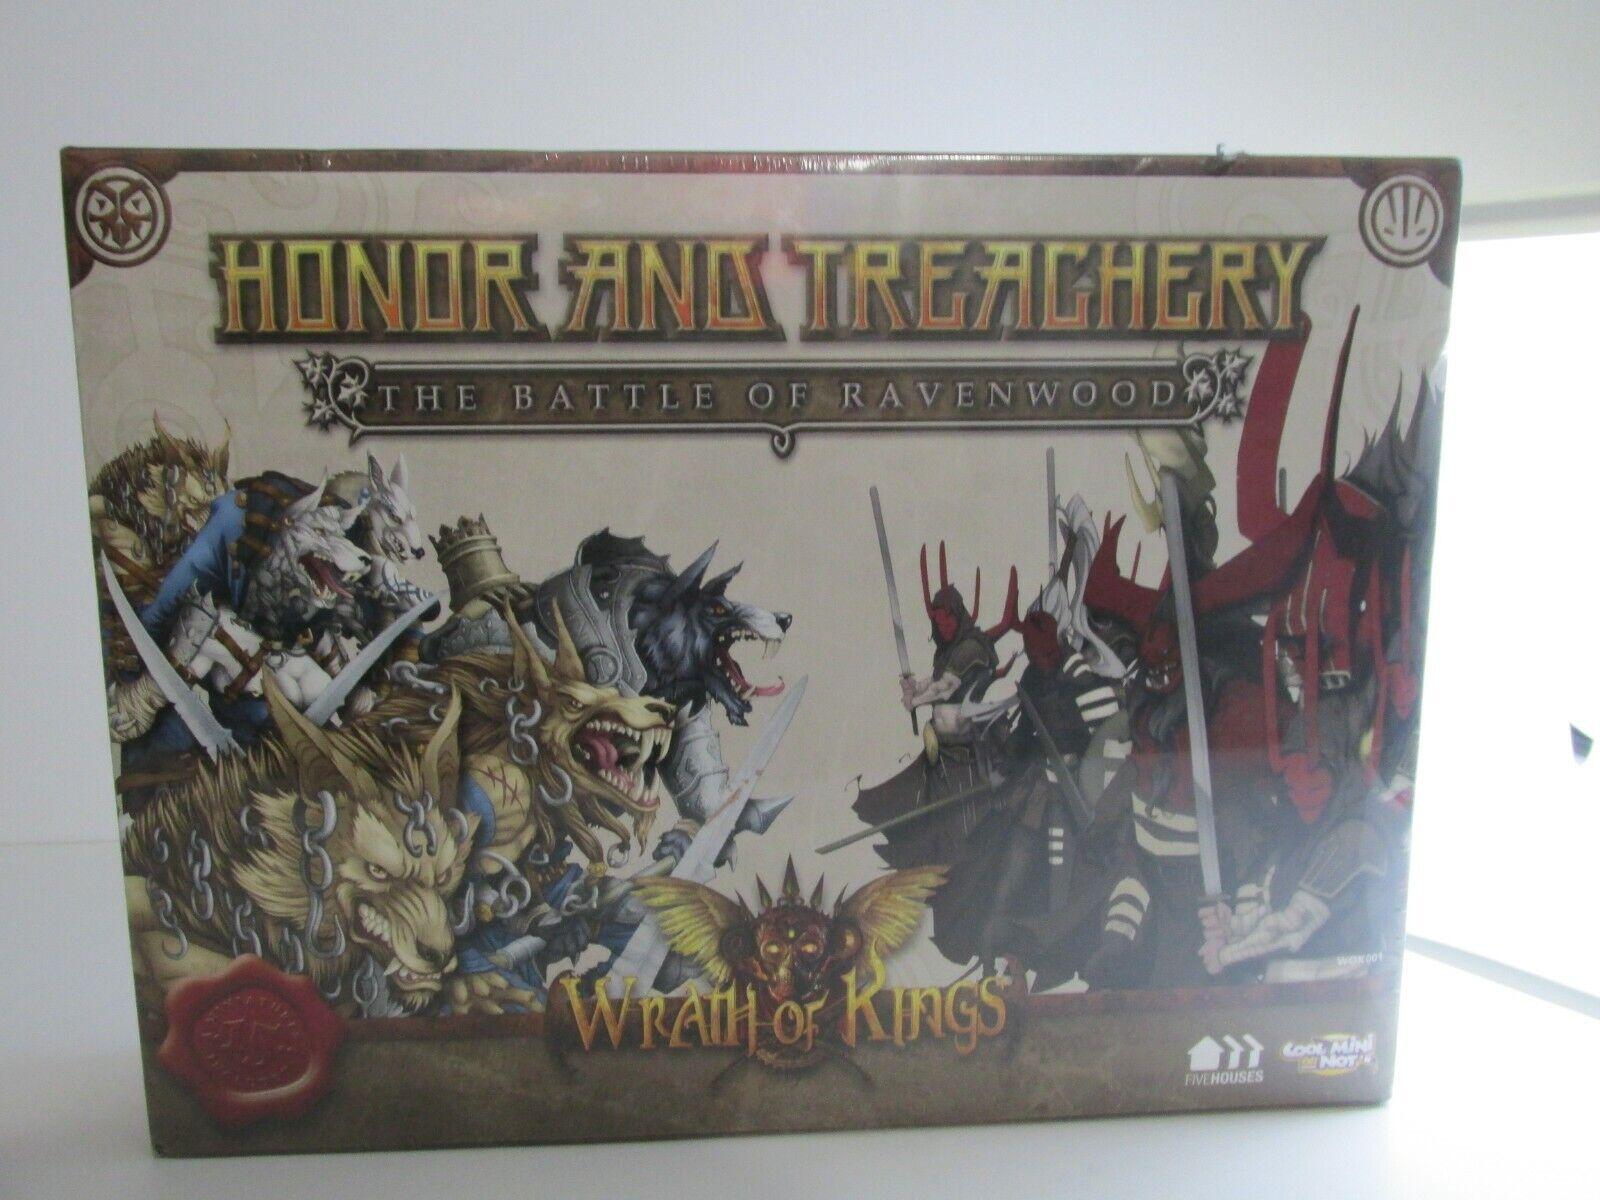 Cmon wok001 zorn kings-honor & verrat 2 spieler starter versiegelt